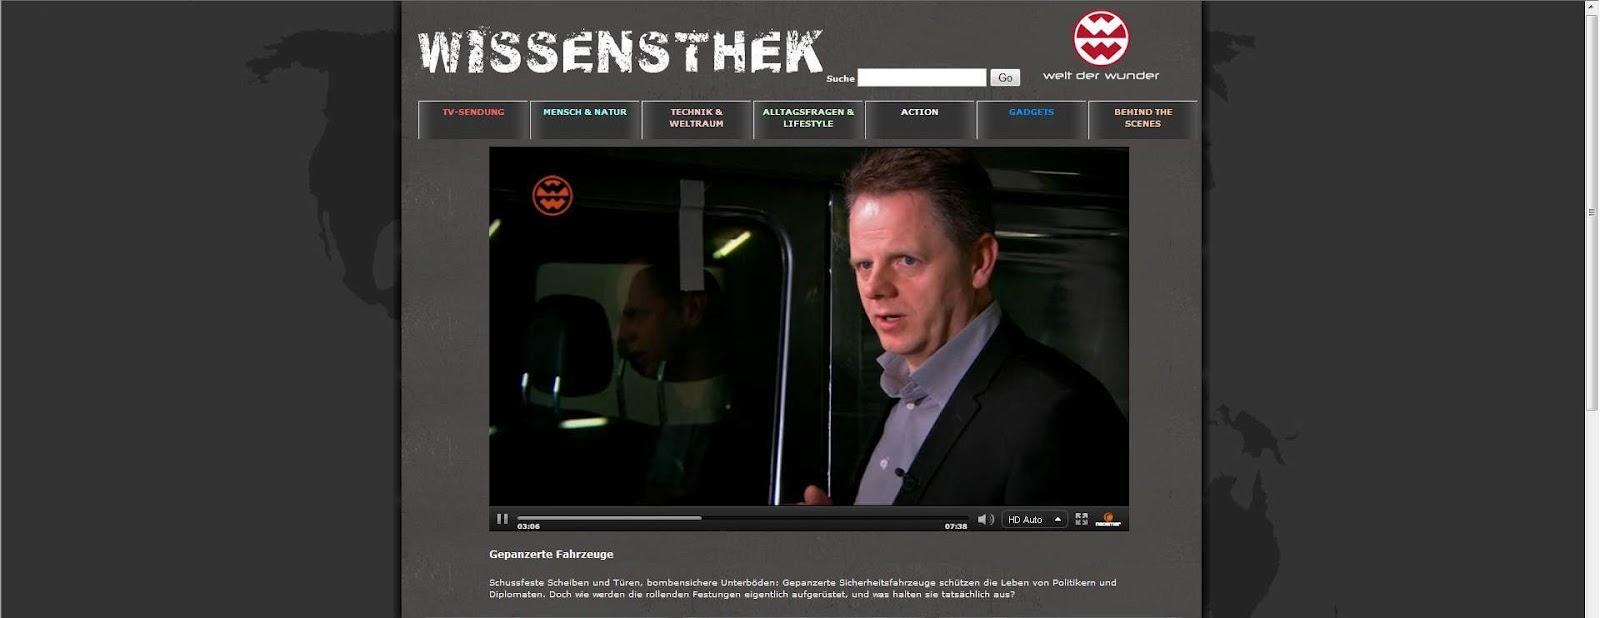 Trasco-forever: Neues von Klaus Ackermann (alpha armoring)